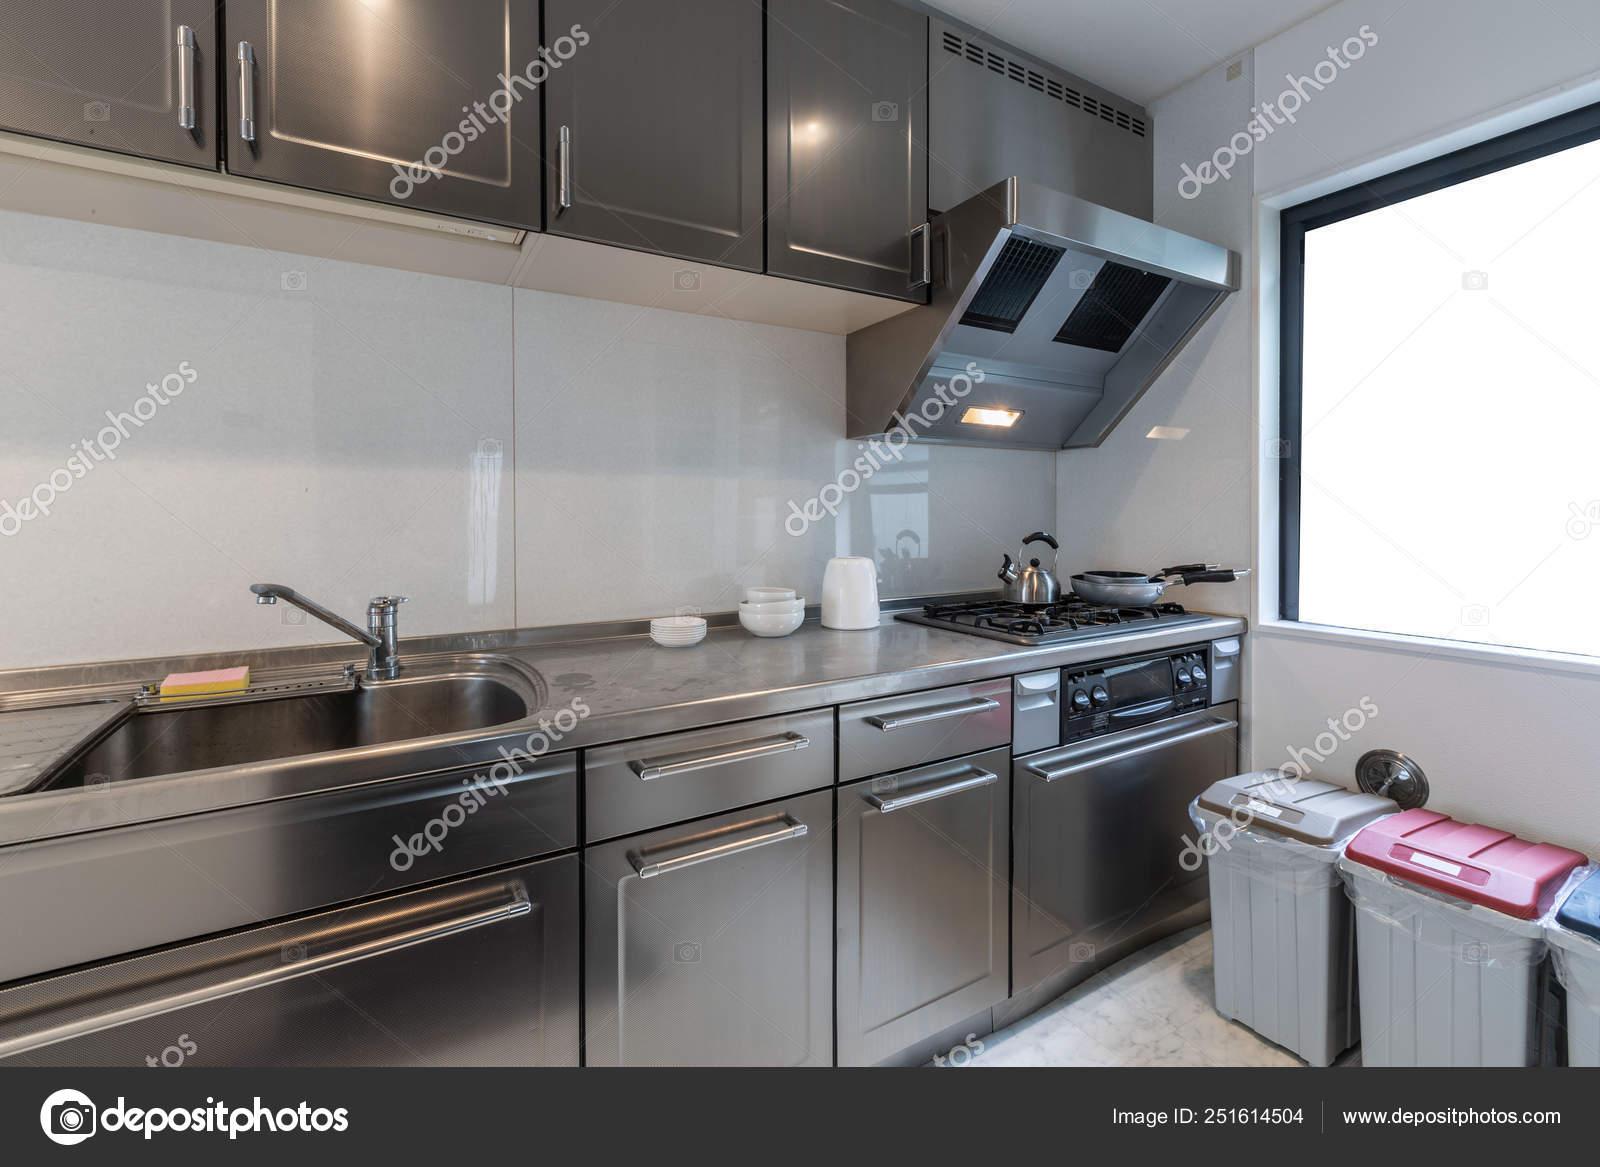 Modern Kitchen Stainless Steel Kitchen Cabinets Stock Editorial Photo C Torsakarin 251614504